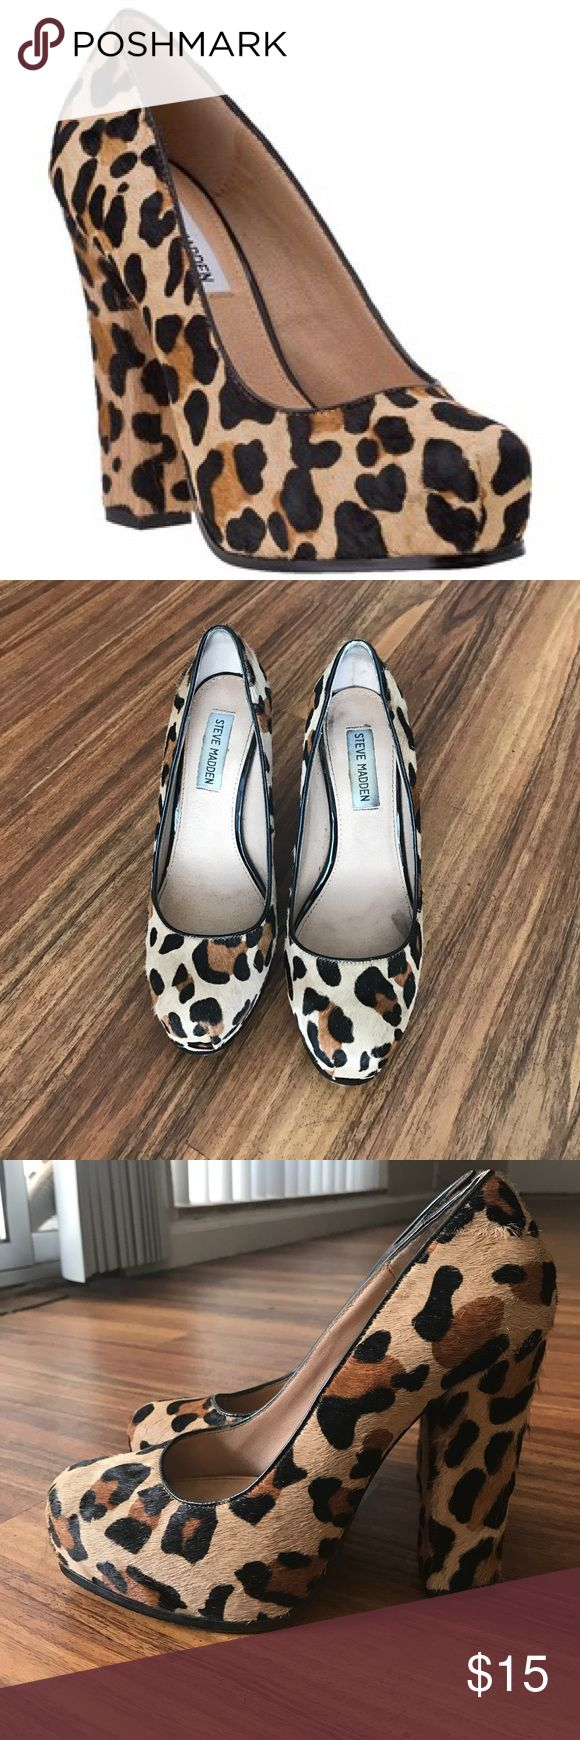 Steve Madden Sarina Cheetah Heels 5inch thick heel Steve maddens. Slightly worn, but in good condition. Steve Madden Shoes Heels